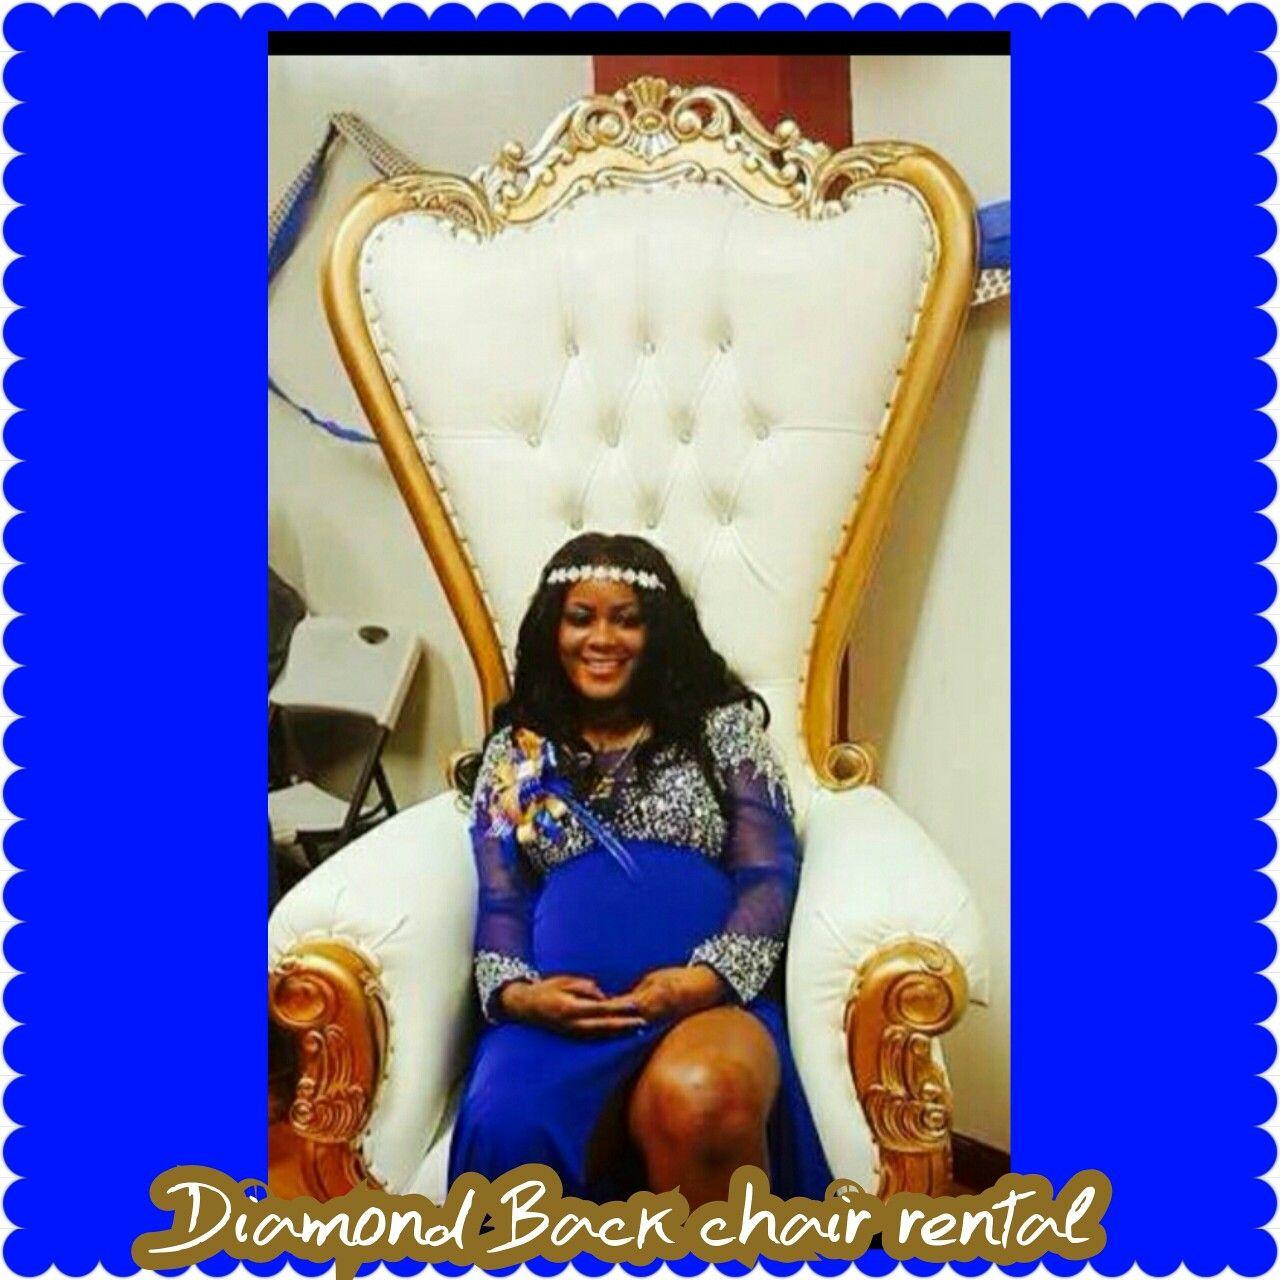 Diamond back chair rentals